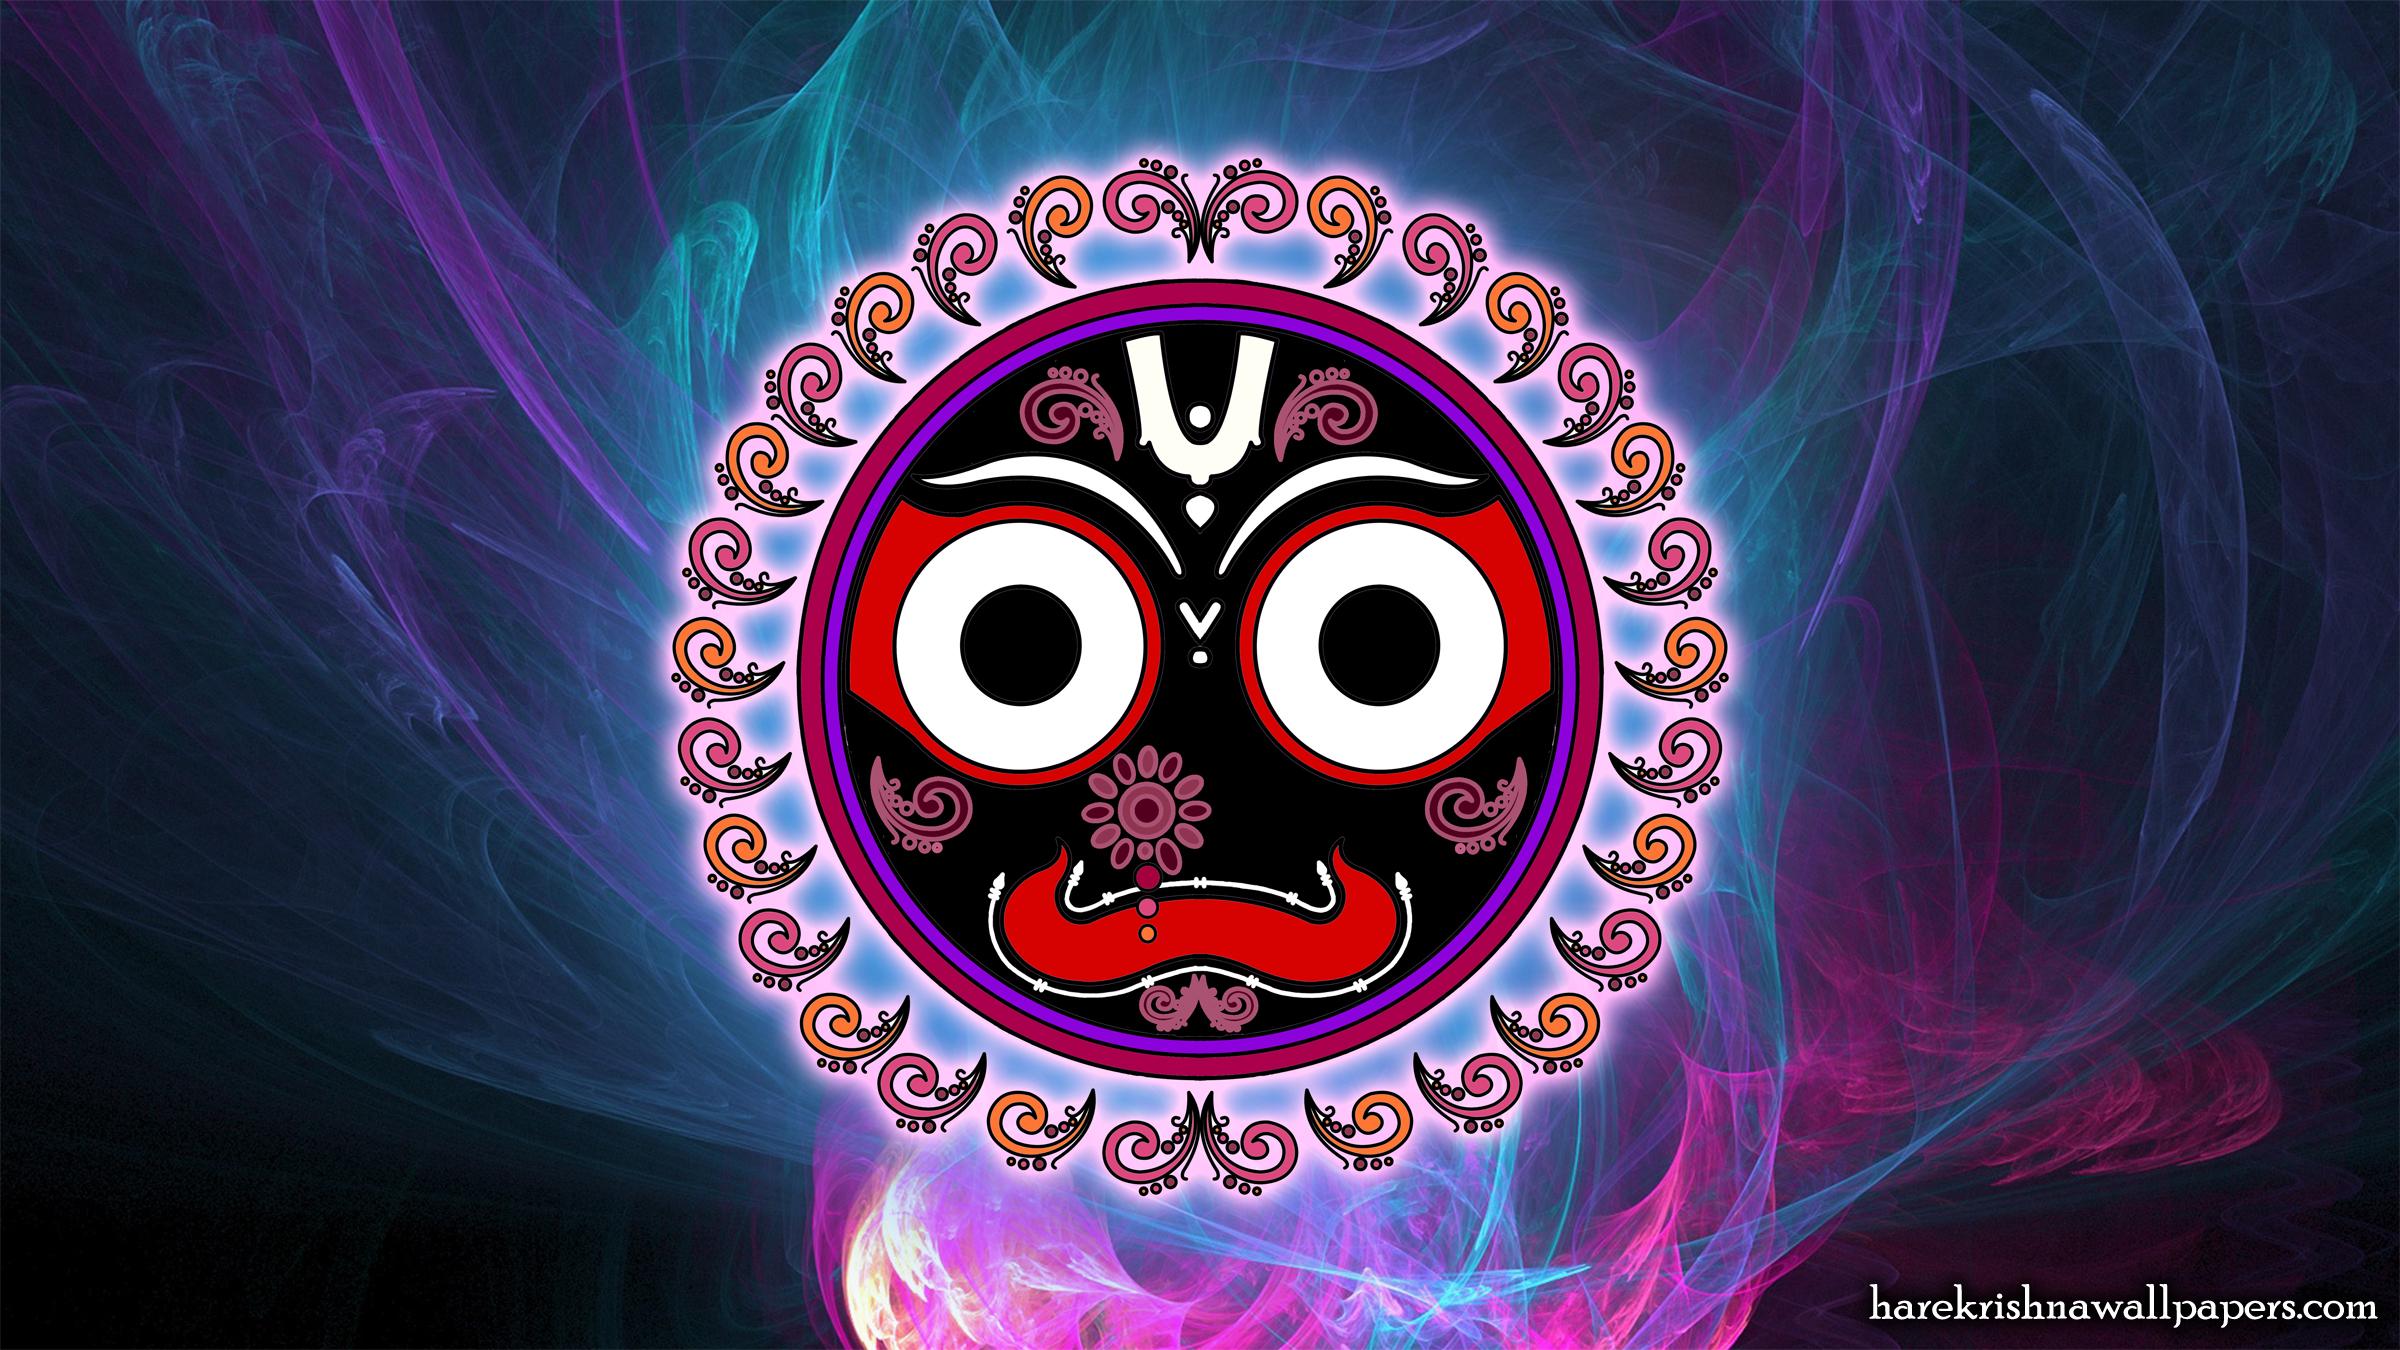 Jai Jagannath Wallpaper (019) Size 2400x1350 Download